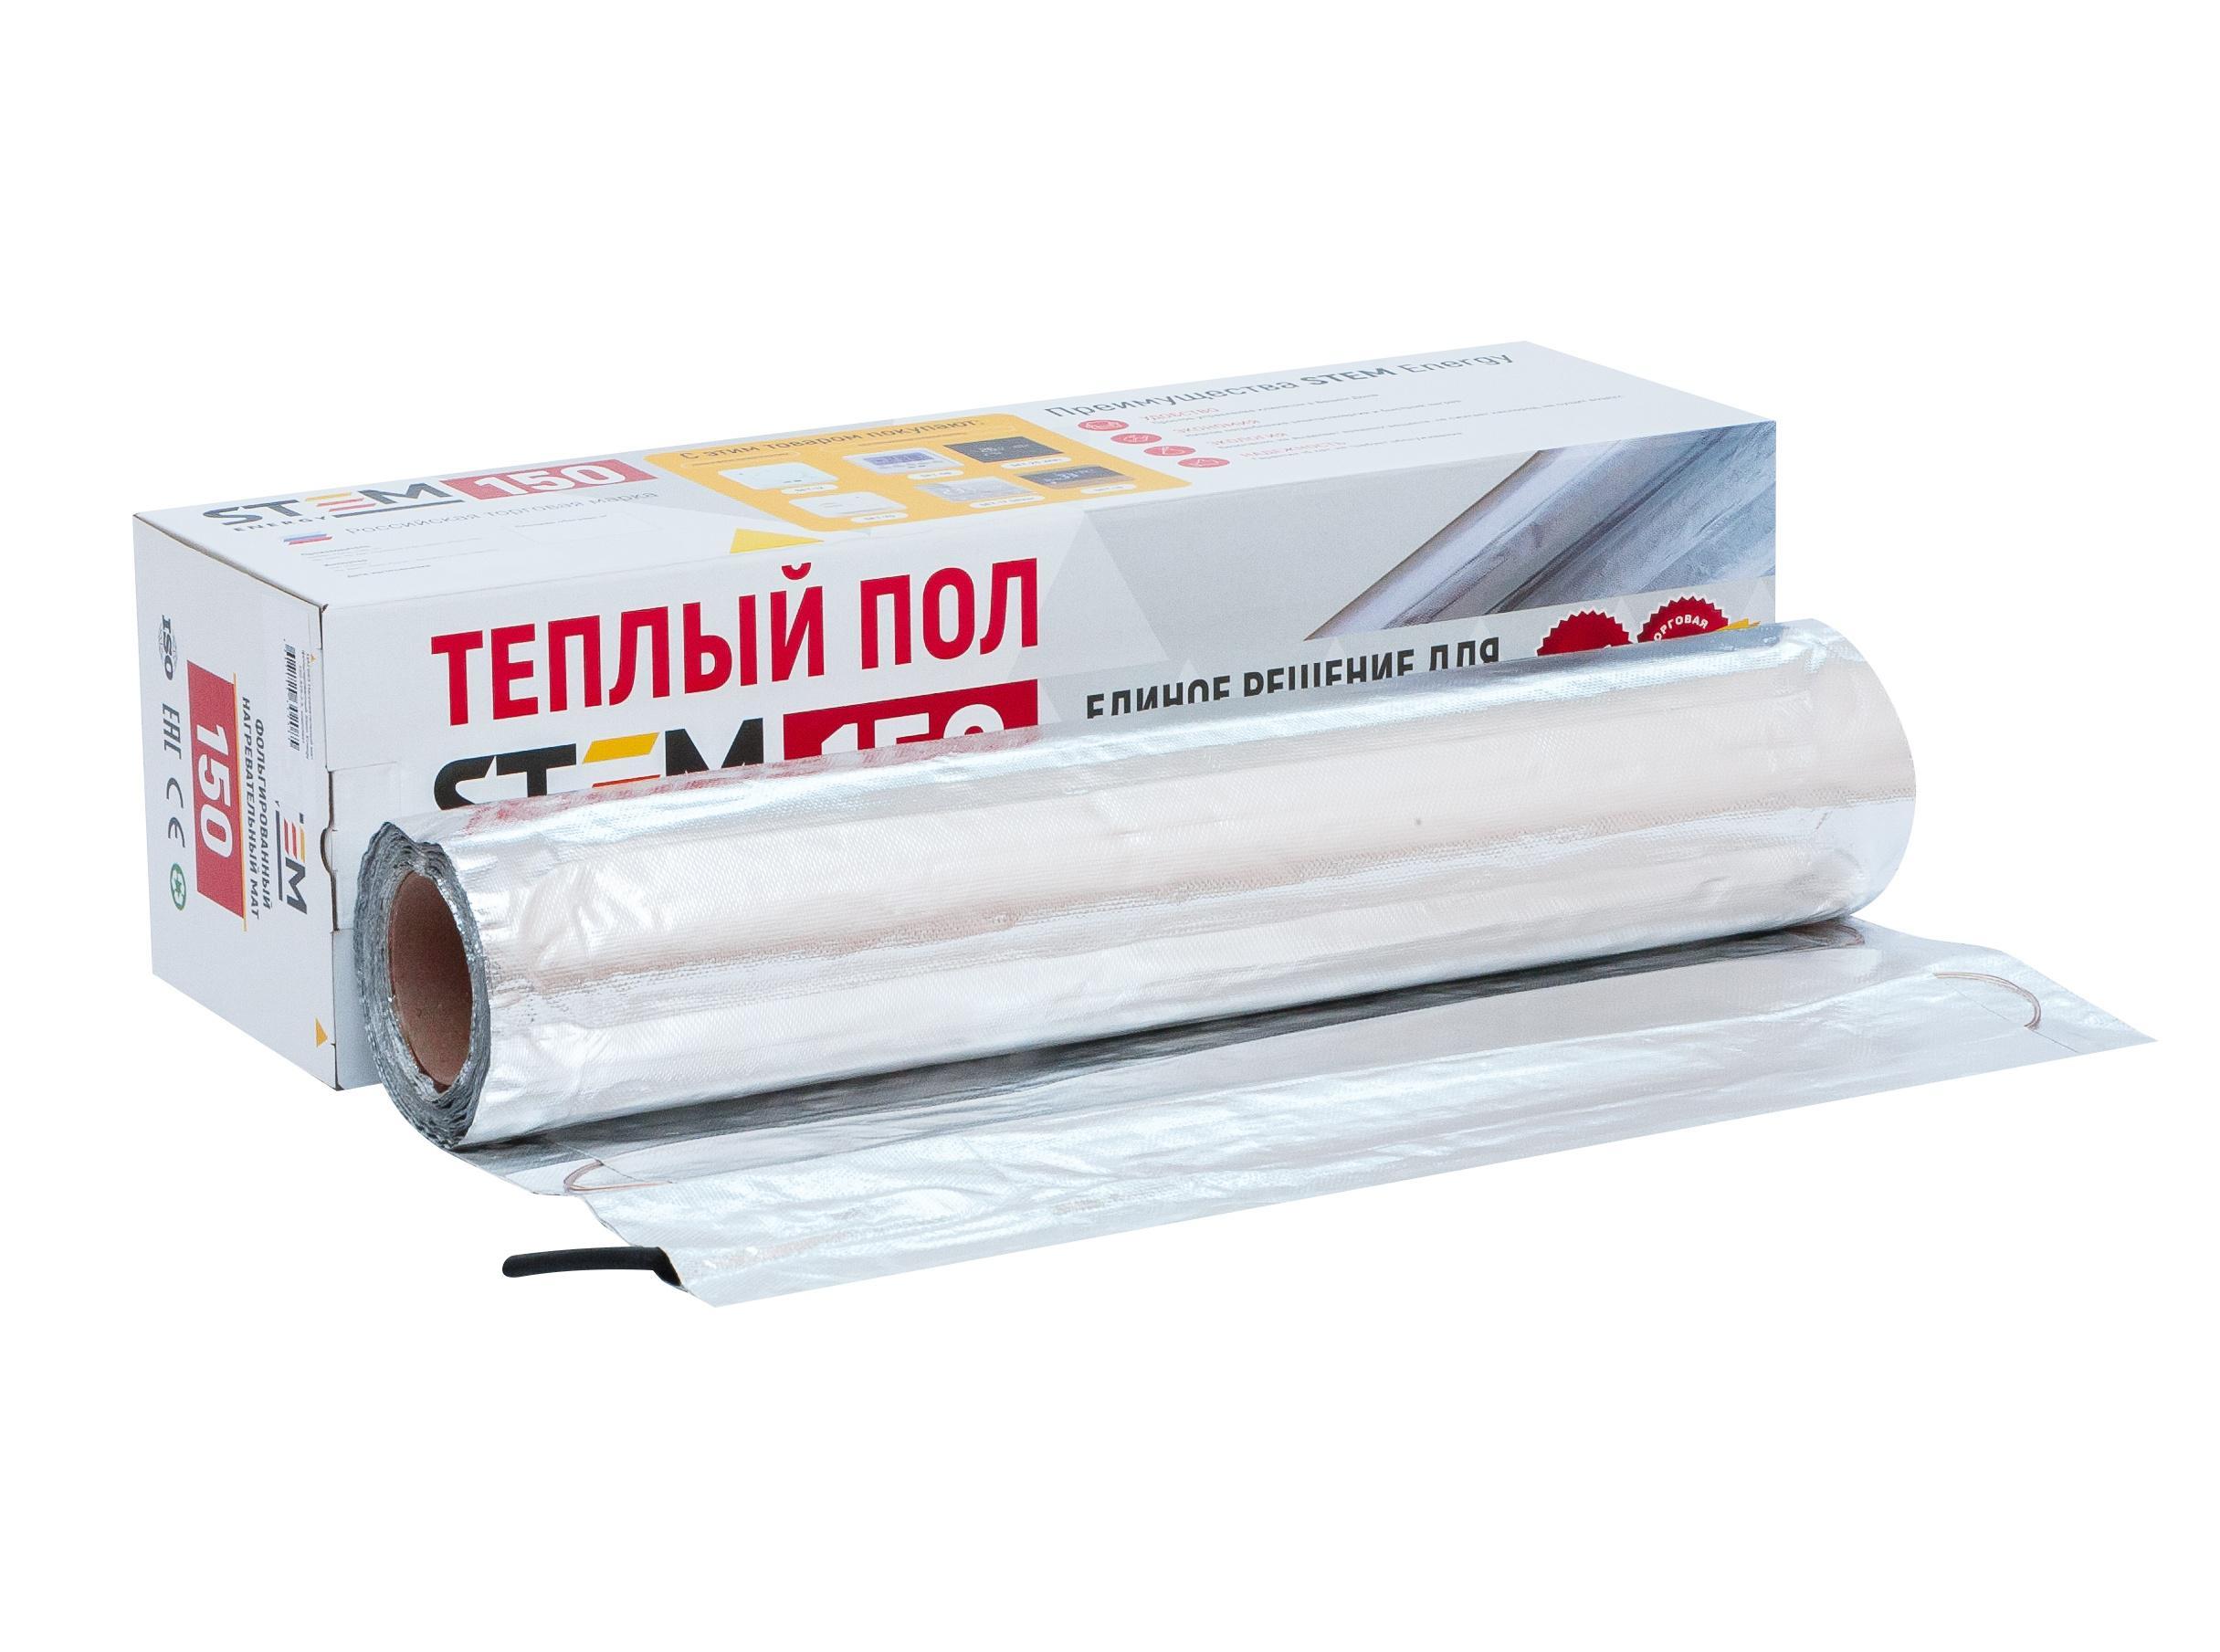 Теплый пол Stem energy 150-450-3.0, 150-450-3.0